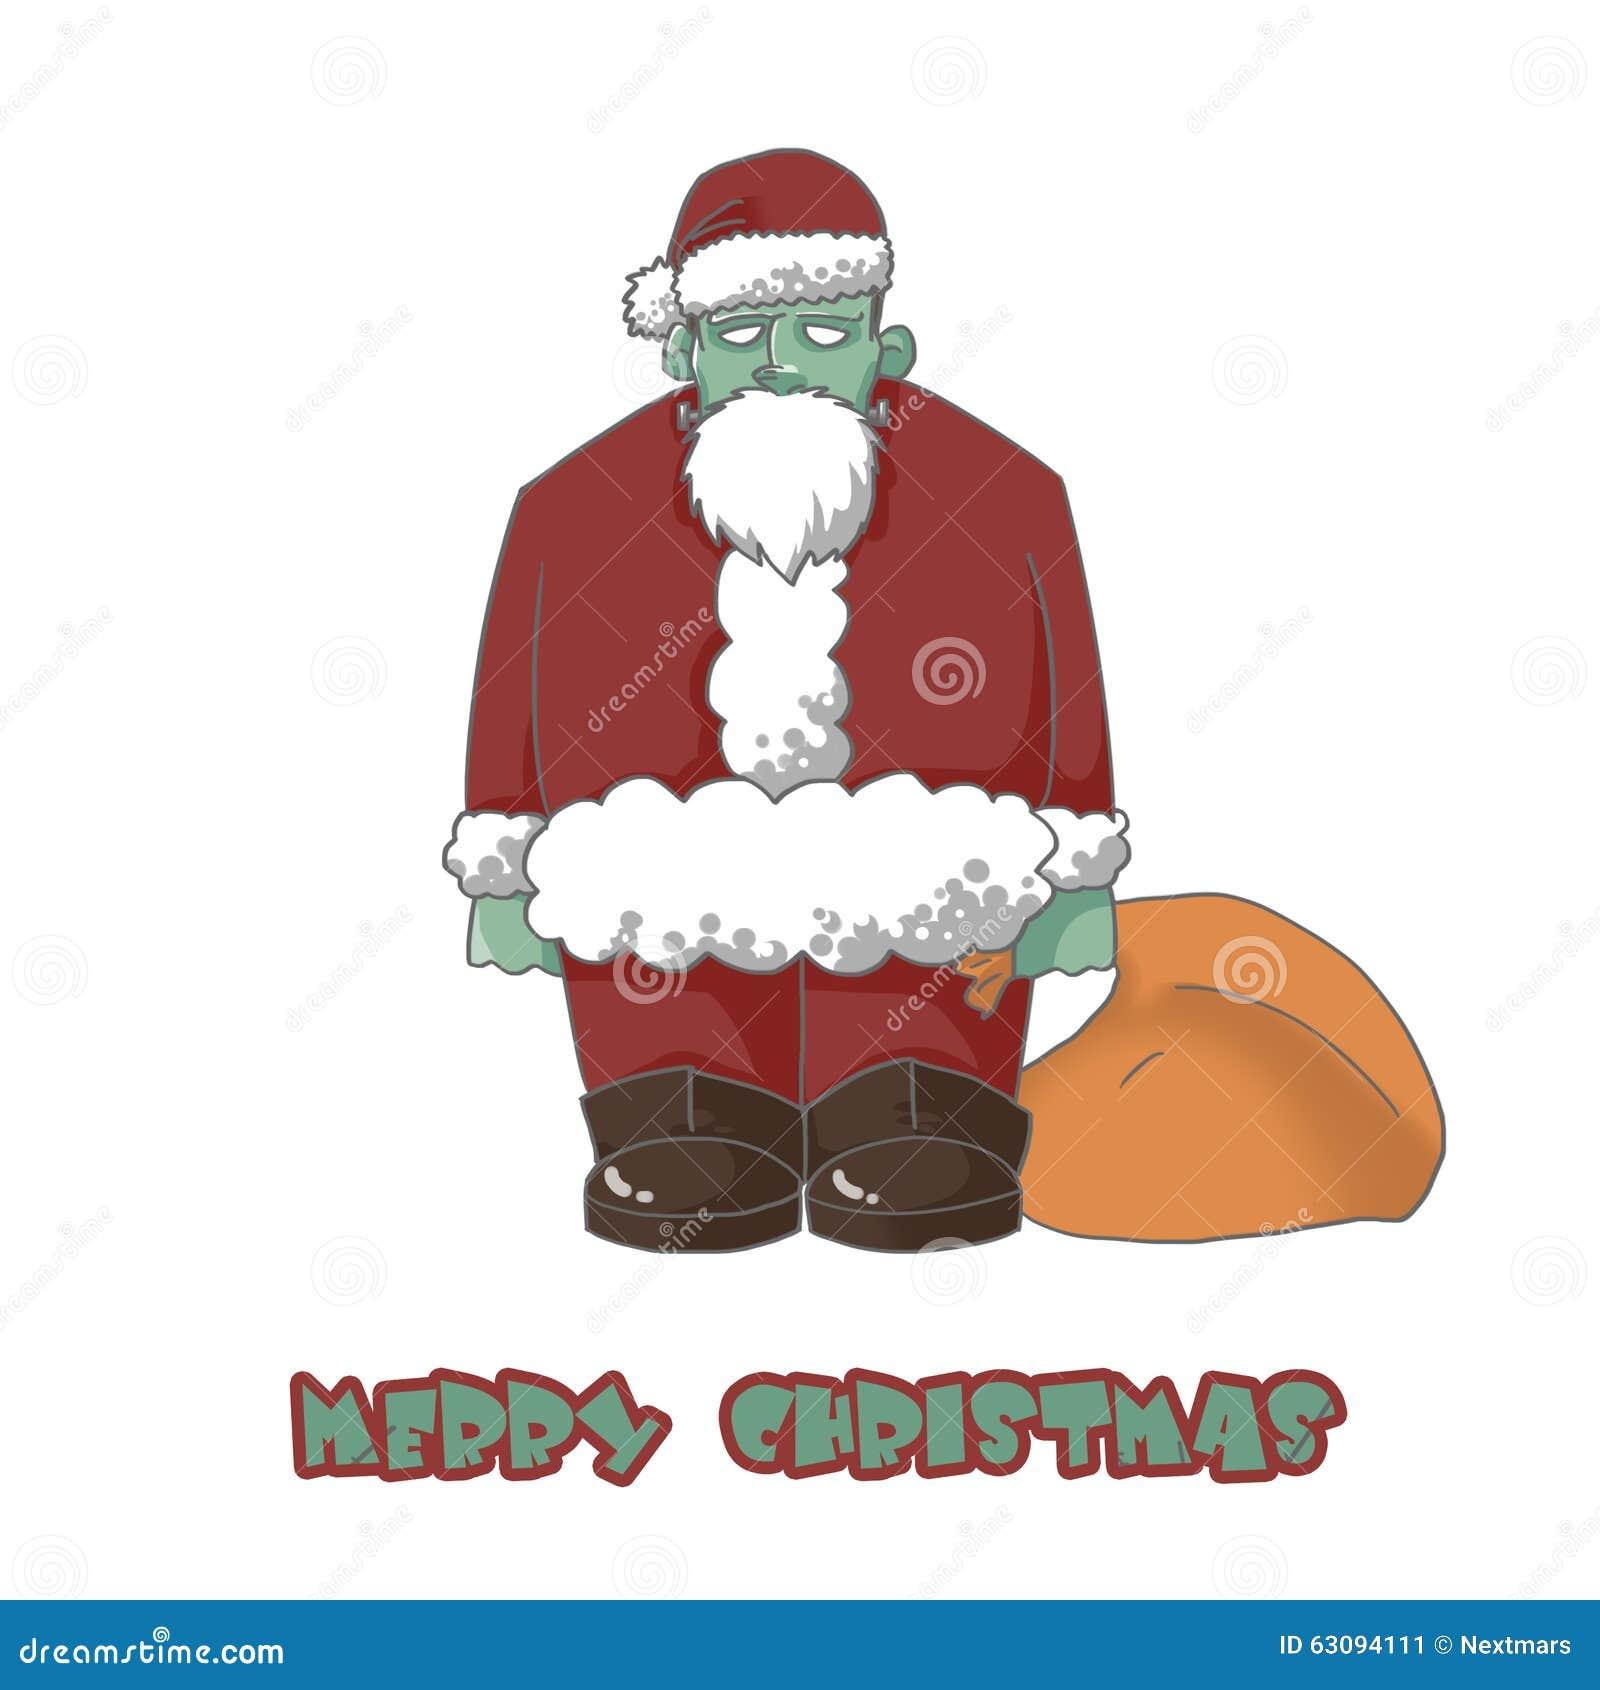 Christmas Zombie Santa.Illustration Character The Zombie Santa Wish You Merry